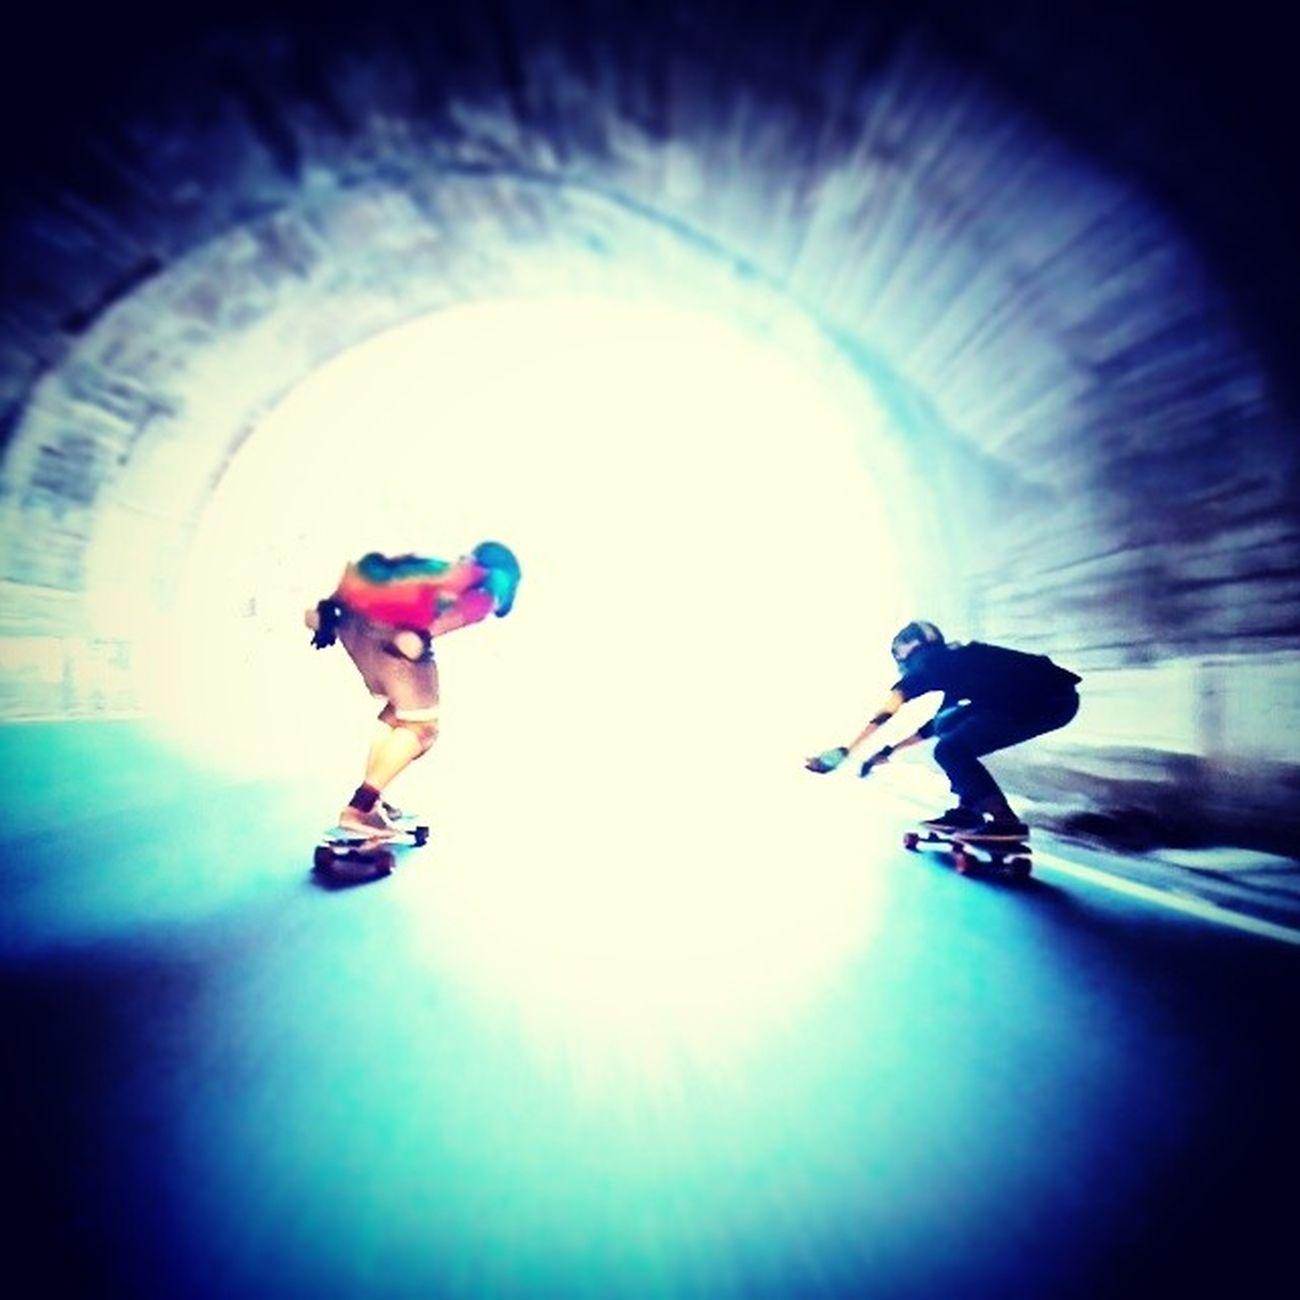 Fire Tunel Longboard Speed No Look Streets Downhill Longskate Malakassputosuo Malakahill